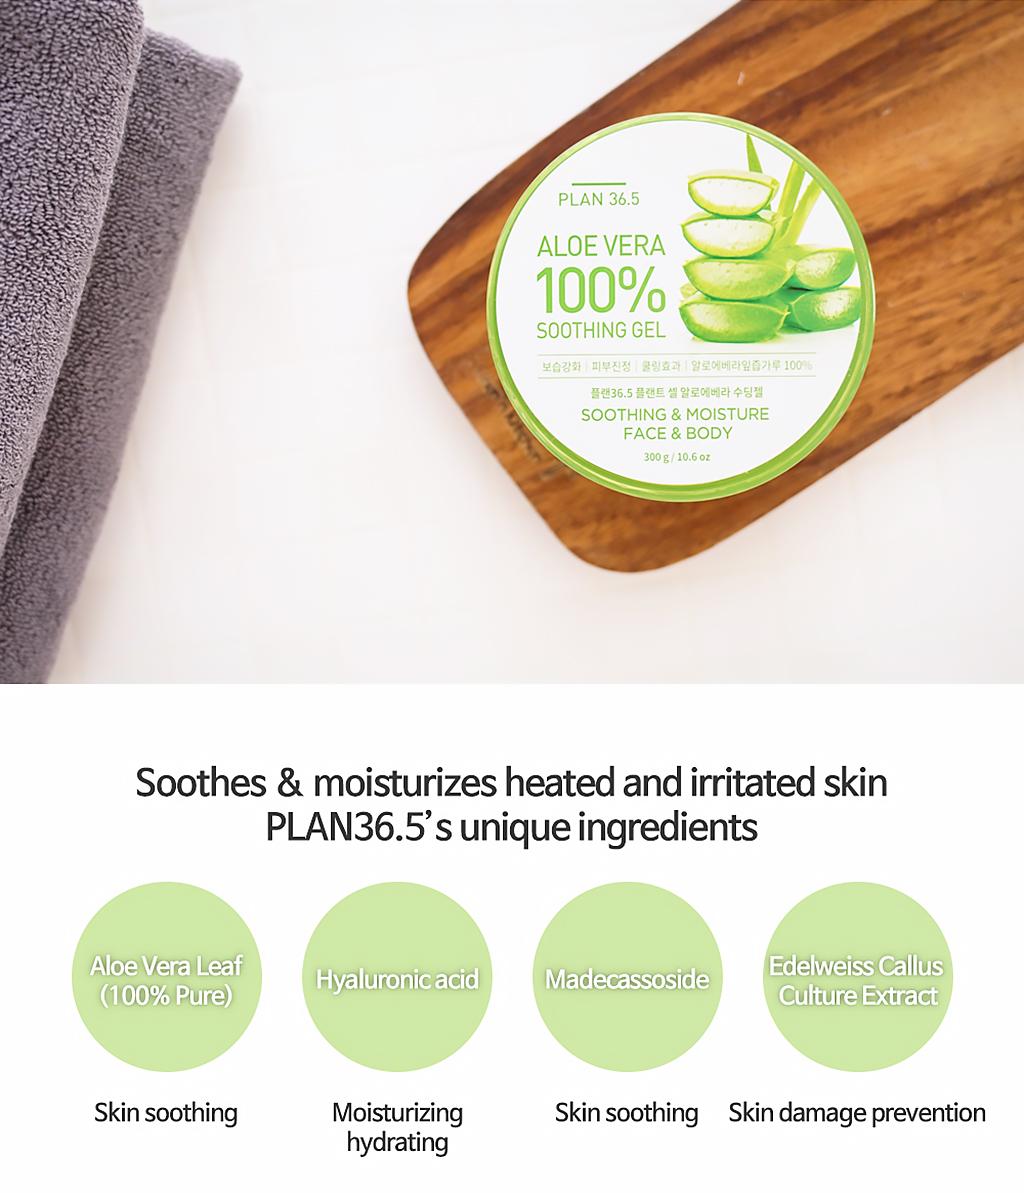 plan365-aloevera-soothing-gel-description-3.jpeg